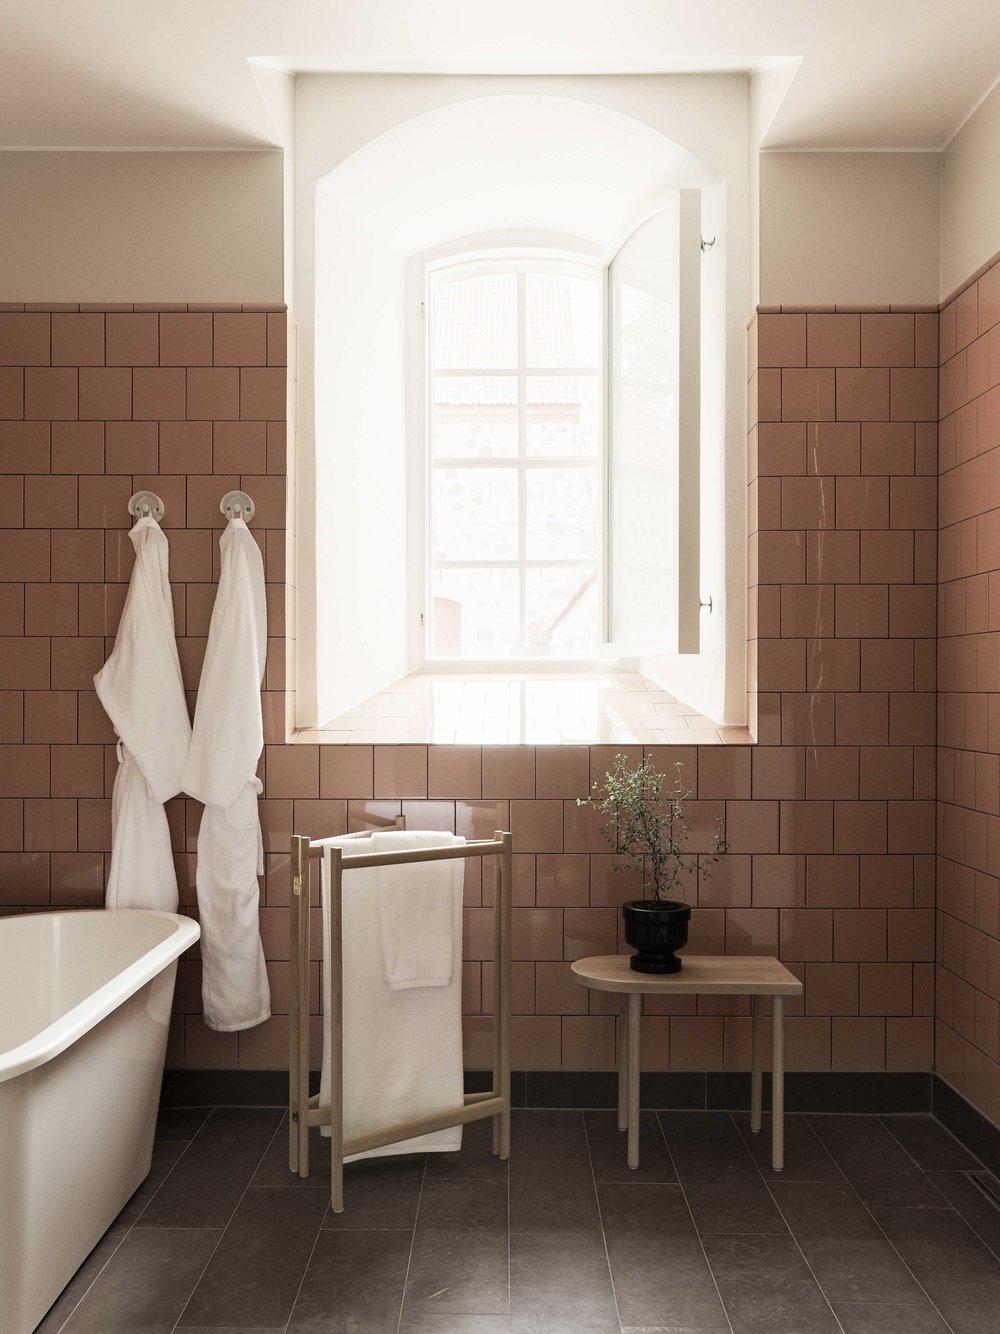 Hotel_bath_mardinger746_WEB.jpg